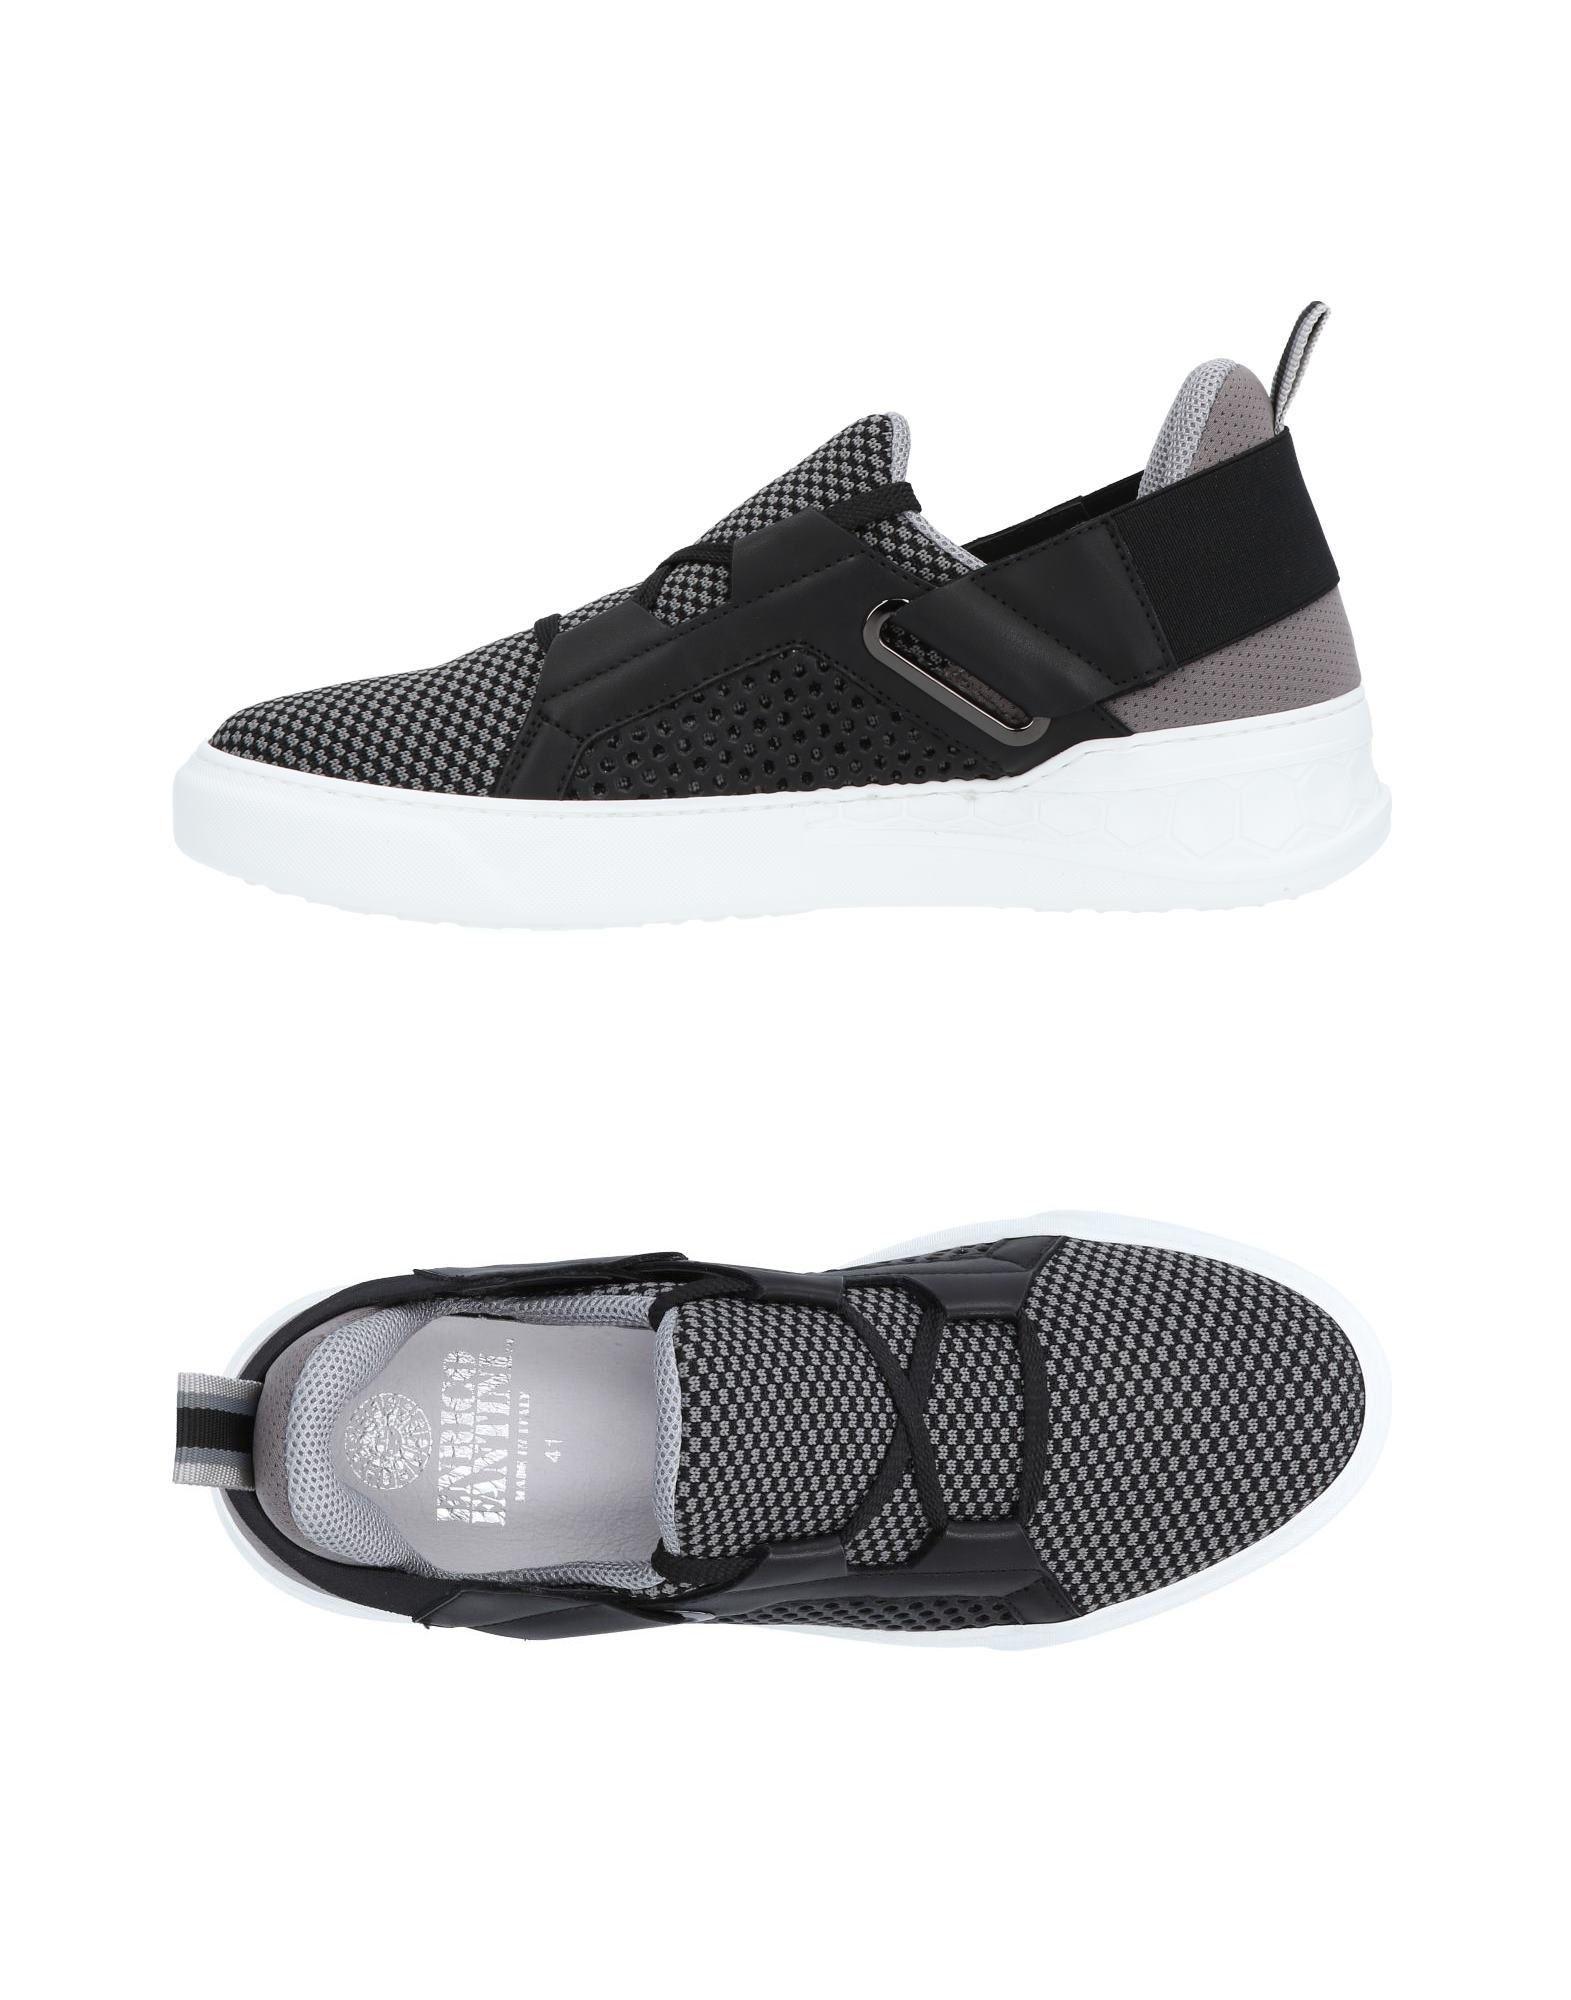 Enrico Fantini Sneakers Sneakers Sneakers Herren  11449104OF Neue Schuhe 335bd9